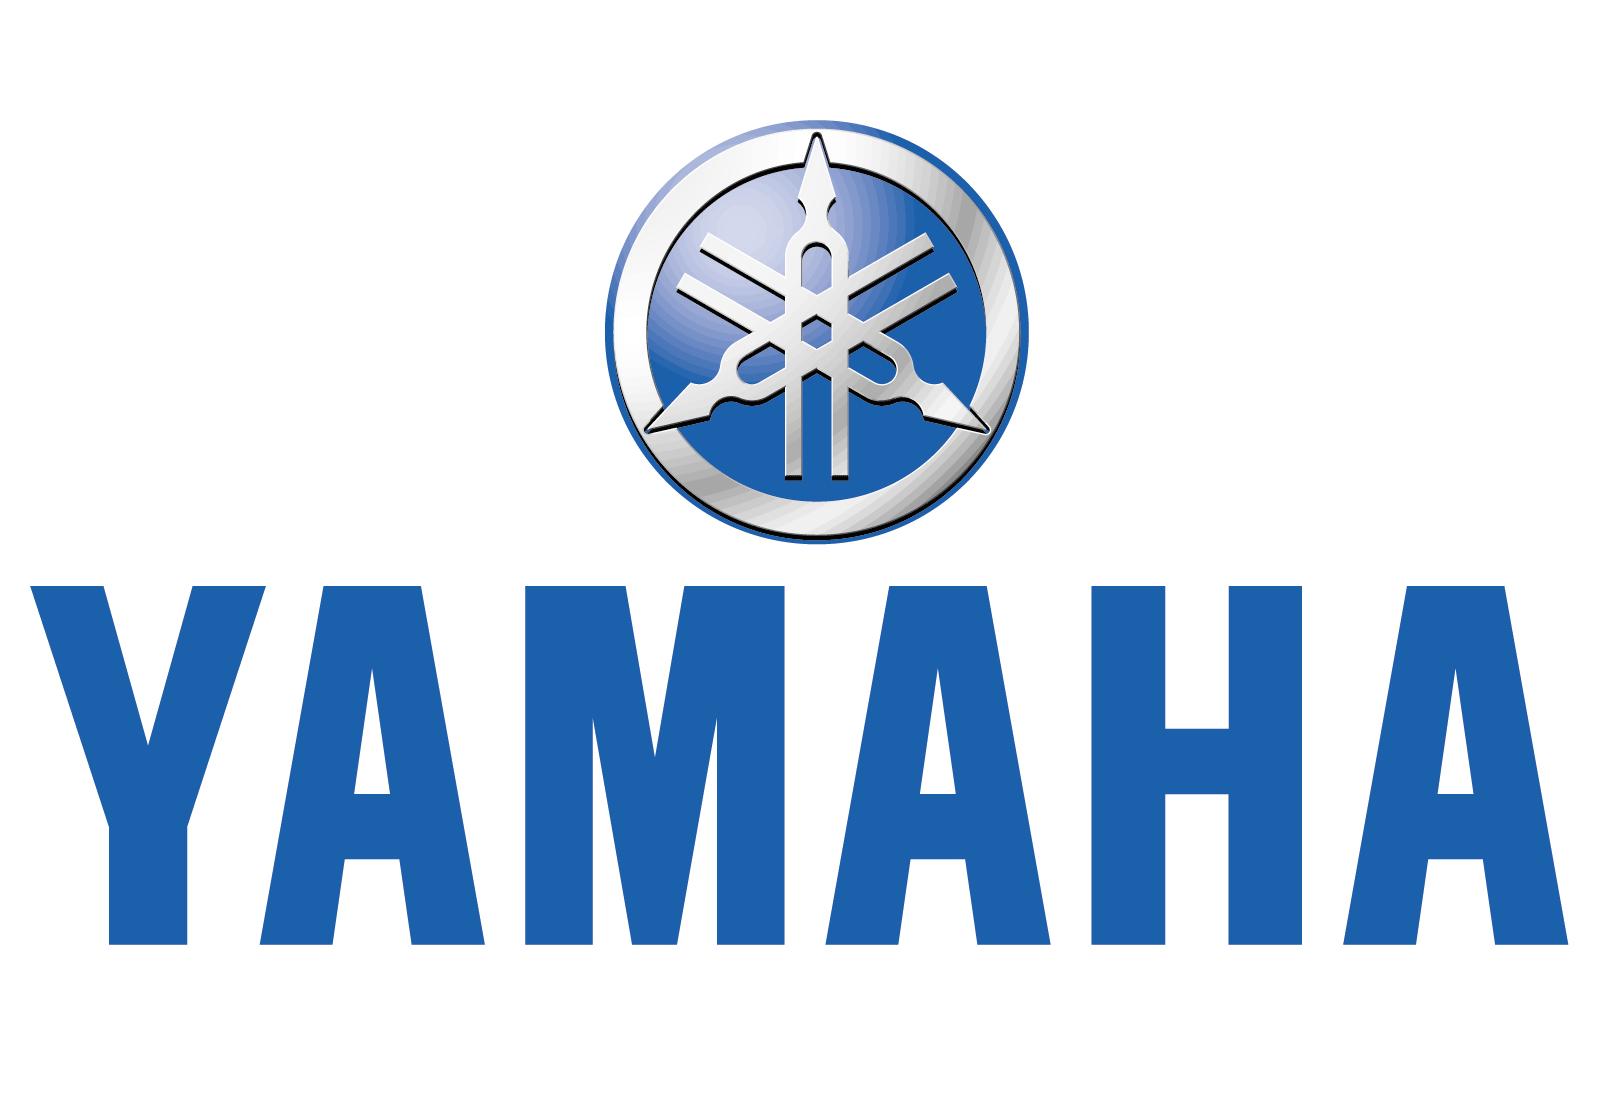 moto yamaha logo